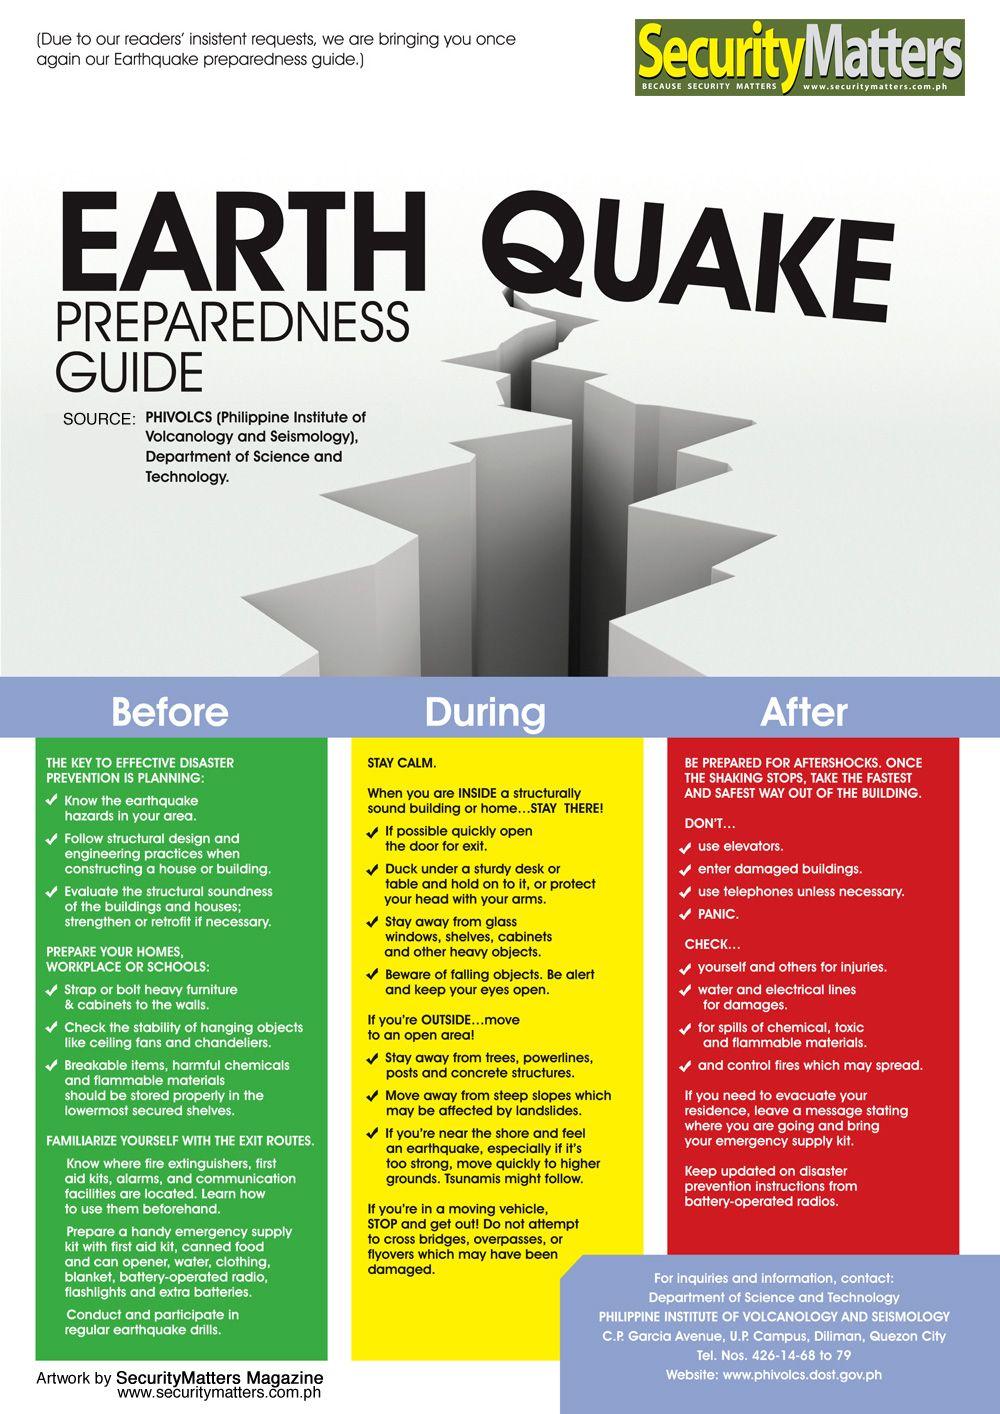 earthquakepreparedness from the Philippine Institute of